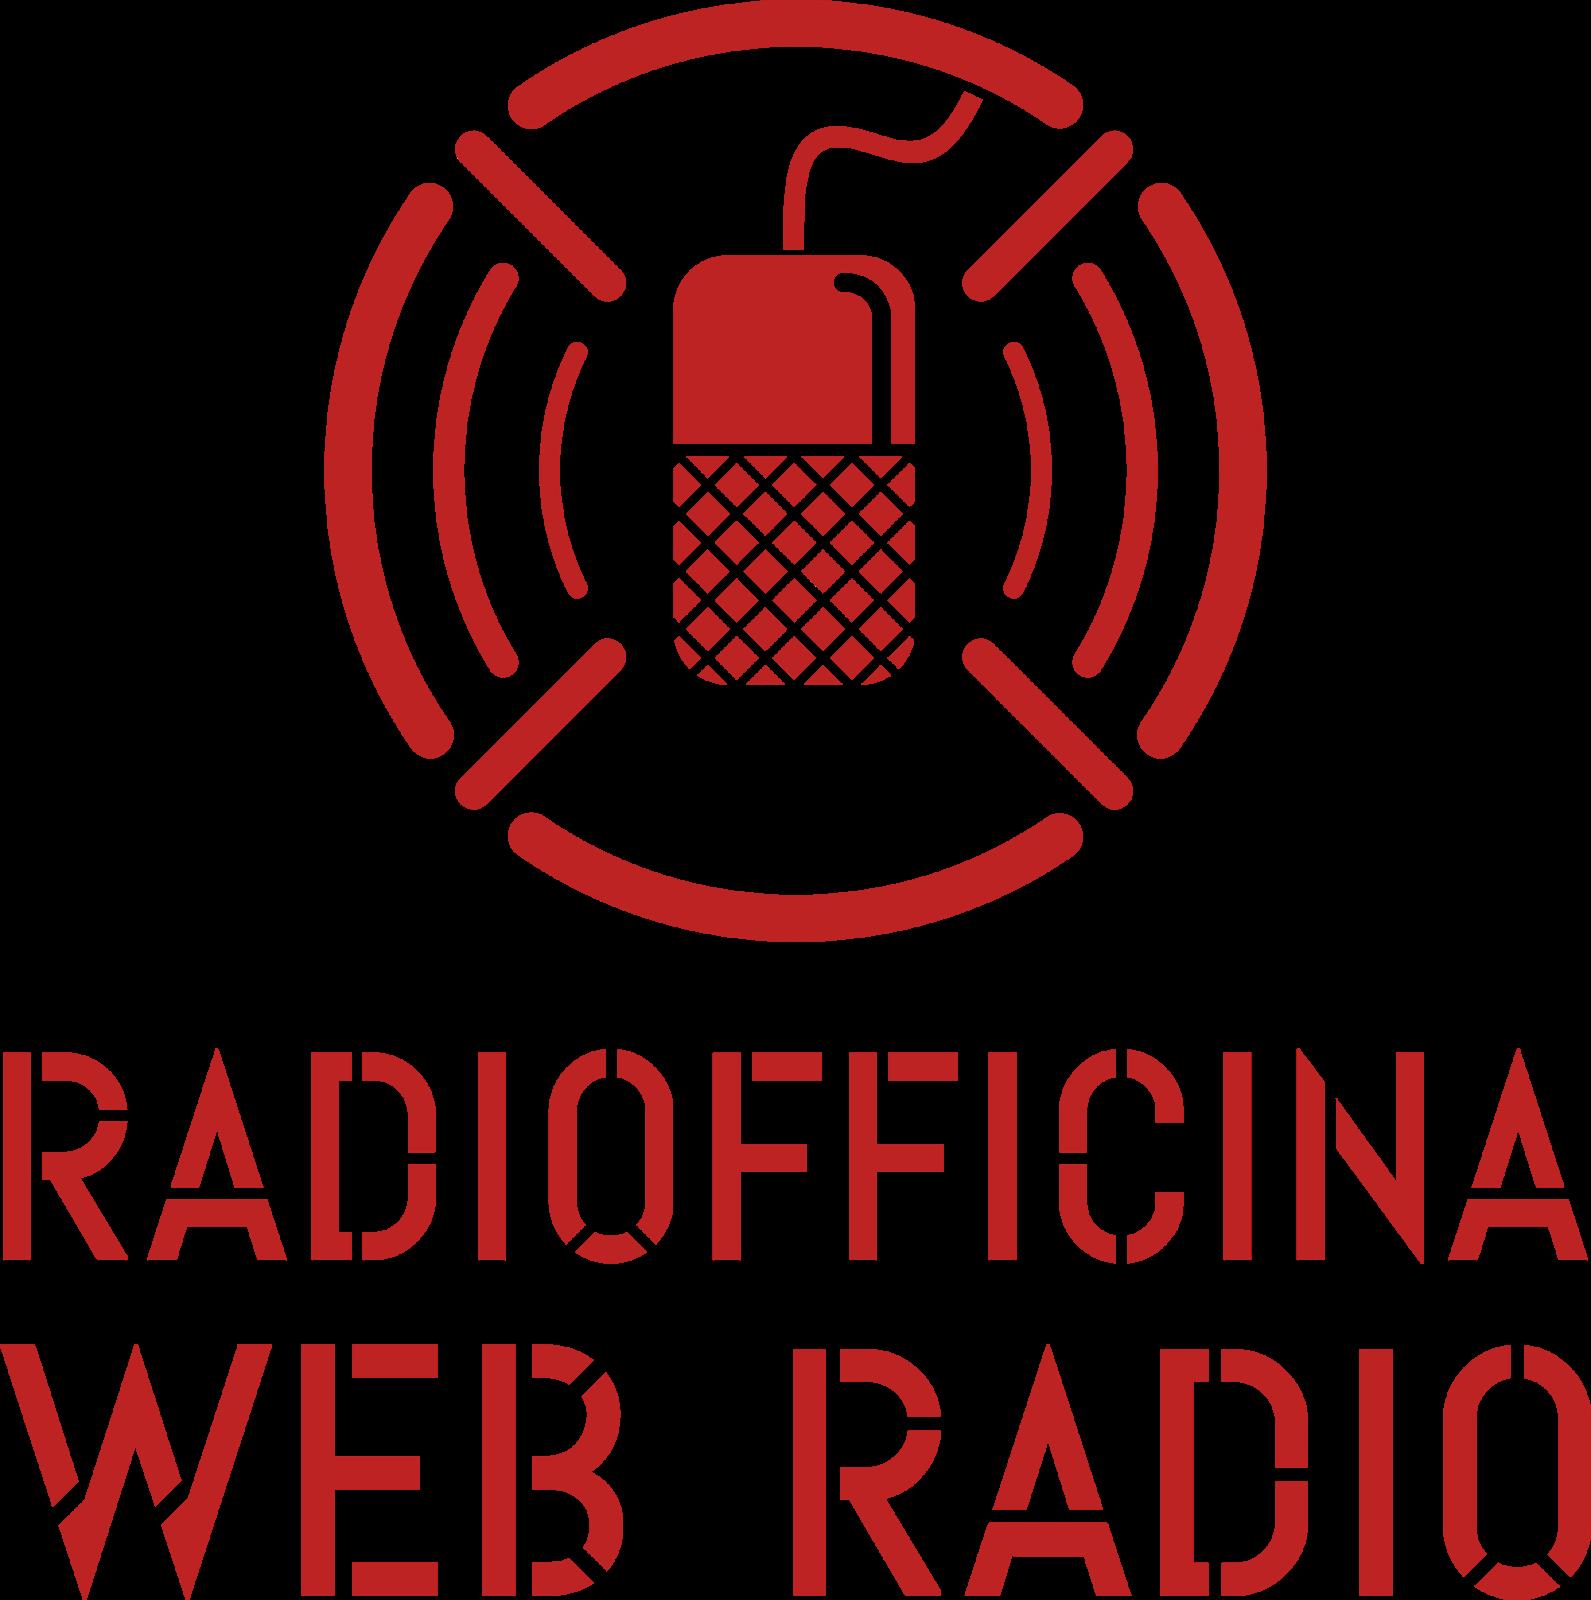 RADIO OFFICINA